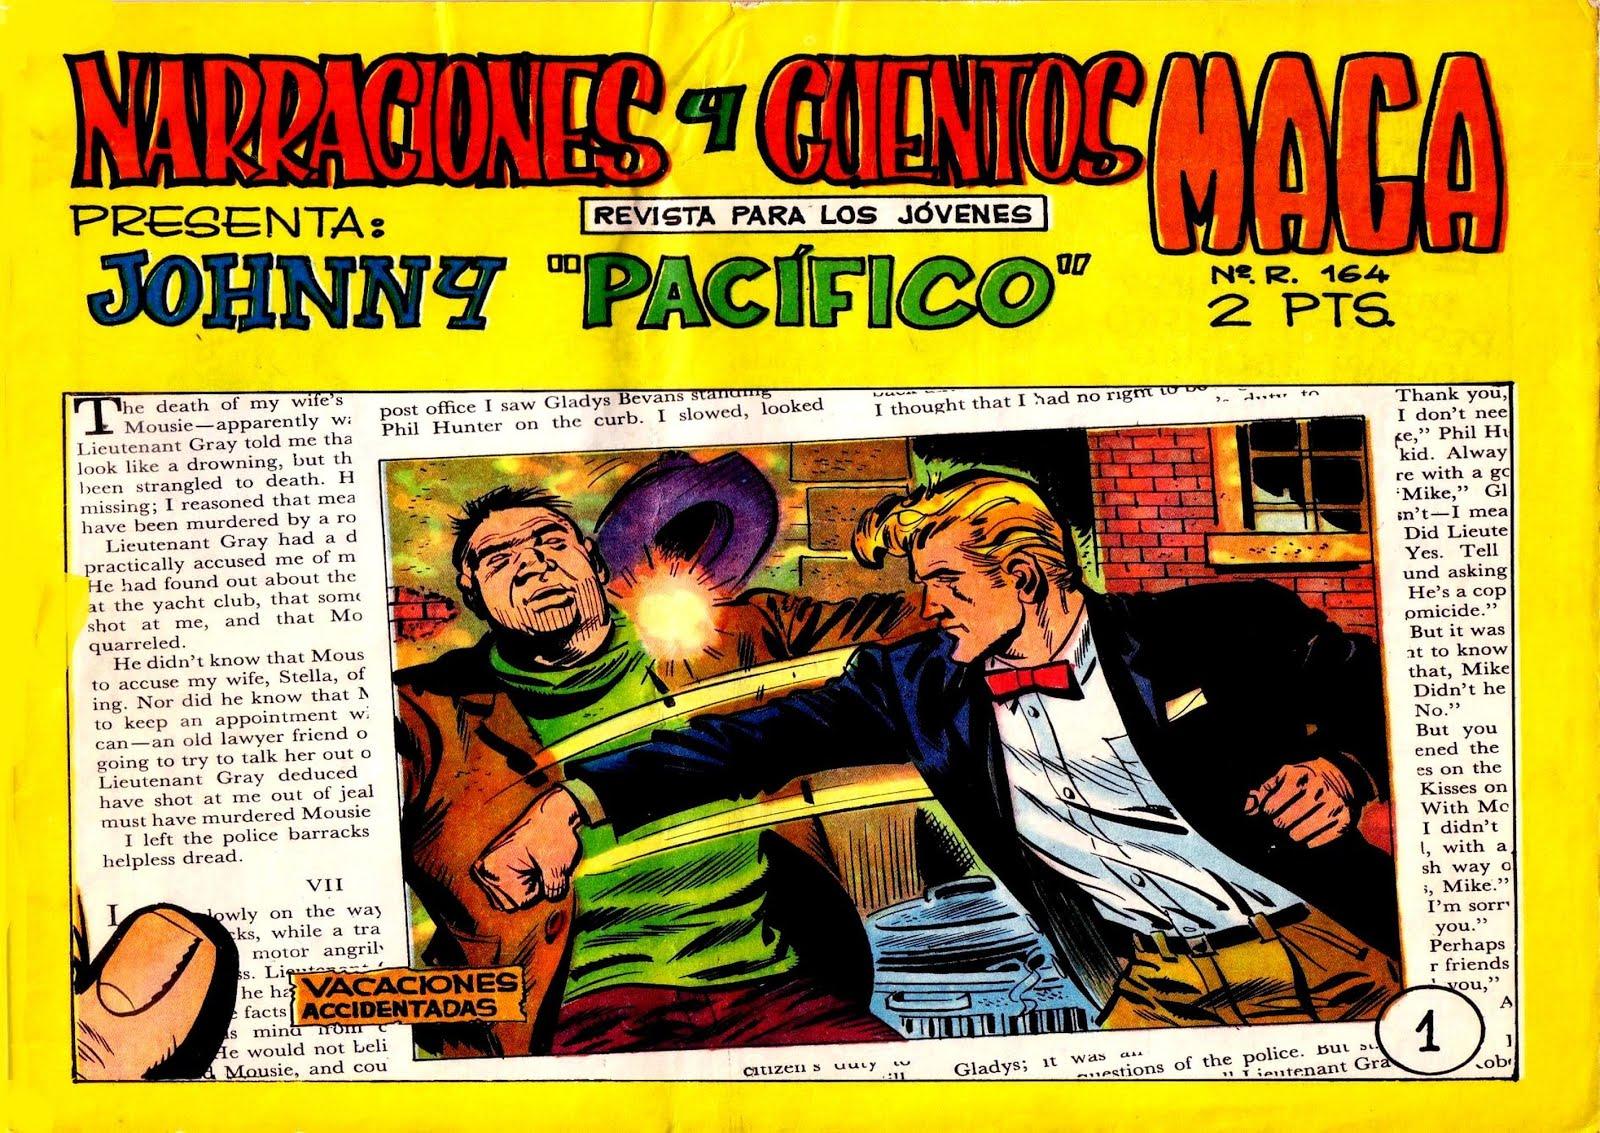 "Johnny ""Pacífico"" [Completo] - Ed. Maga"